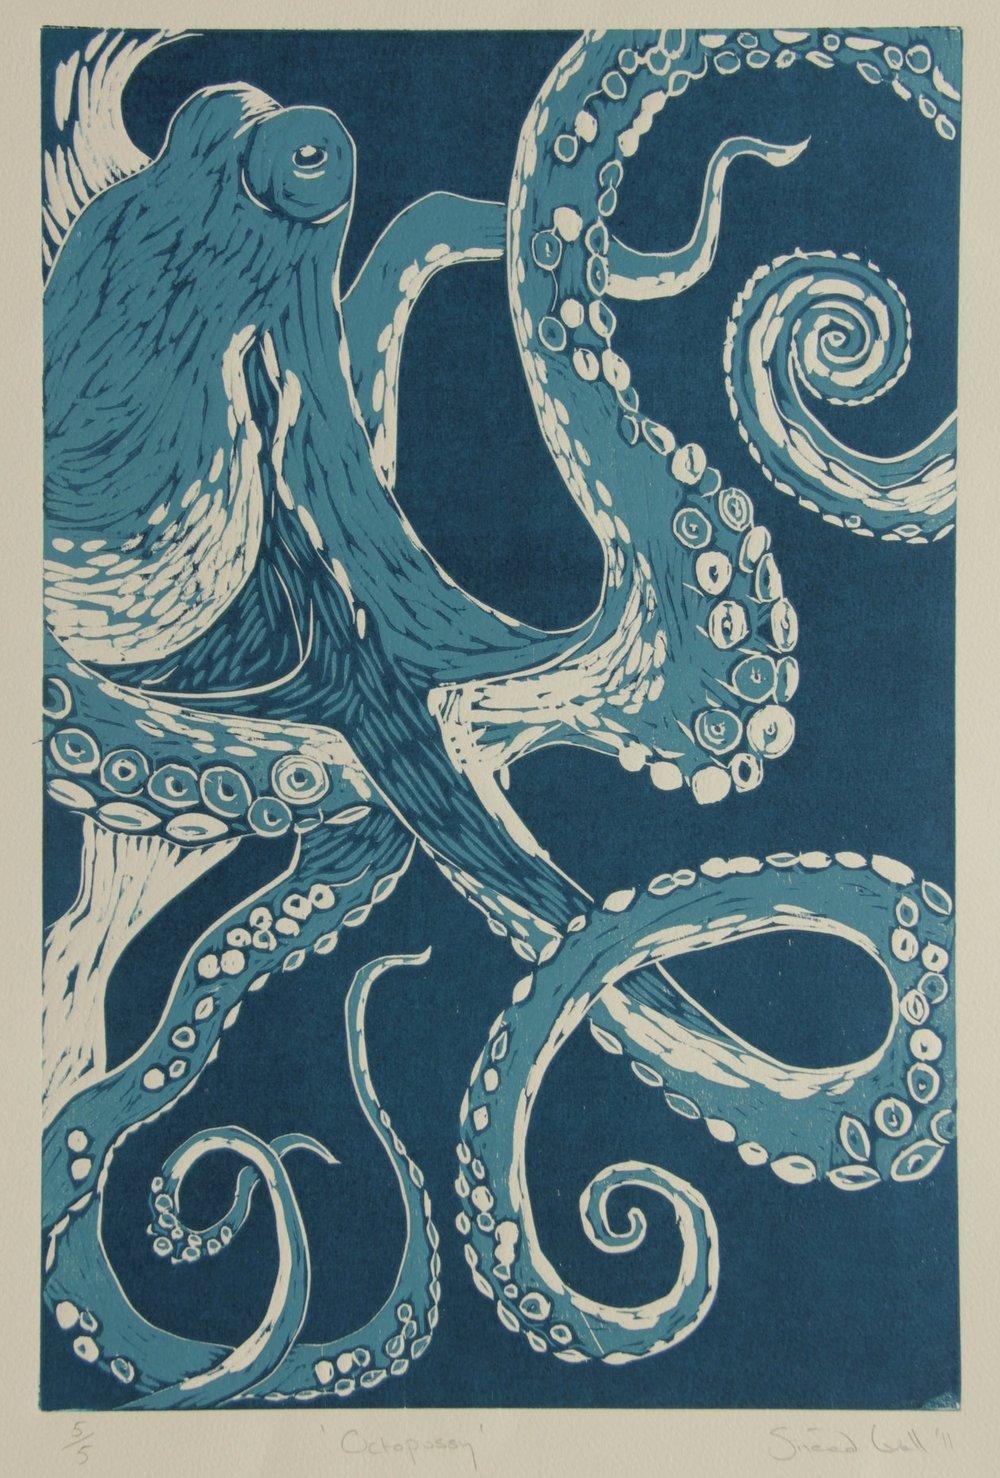 'Octopussy'